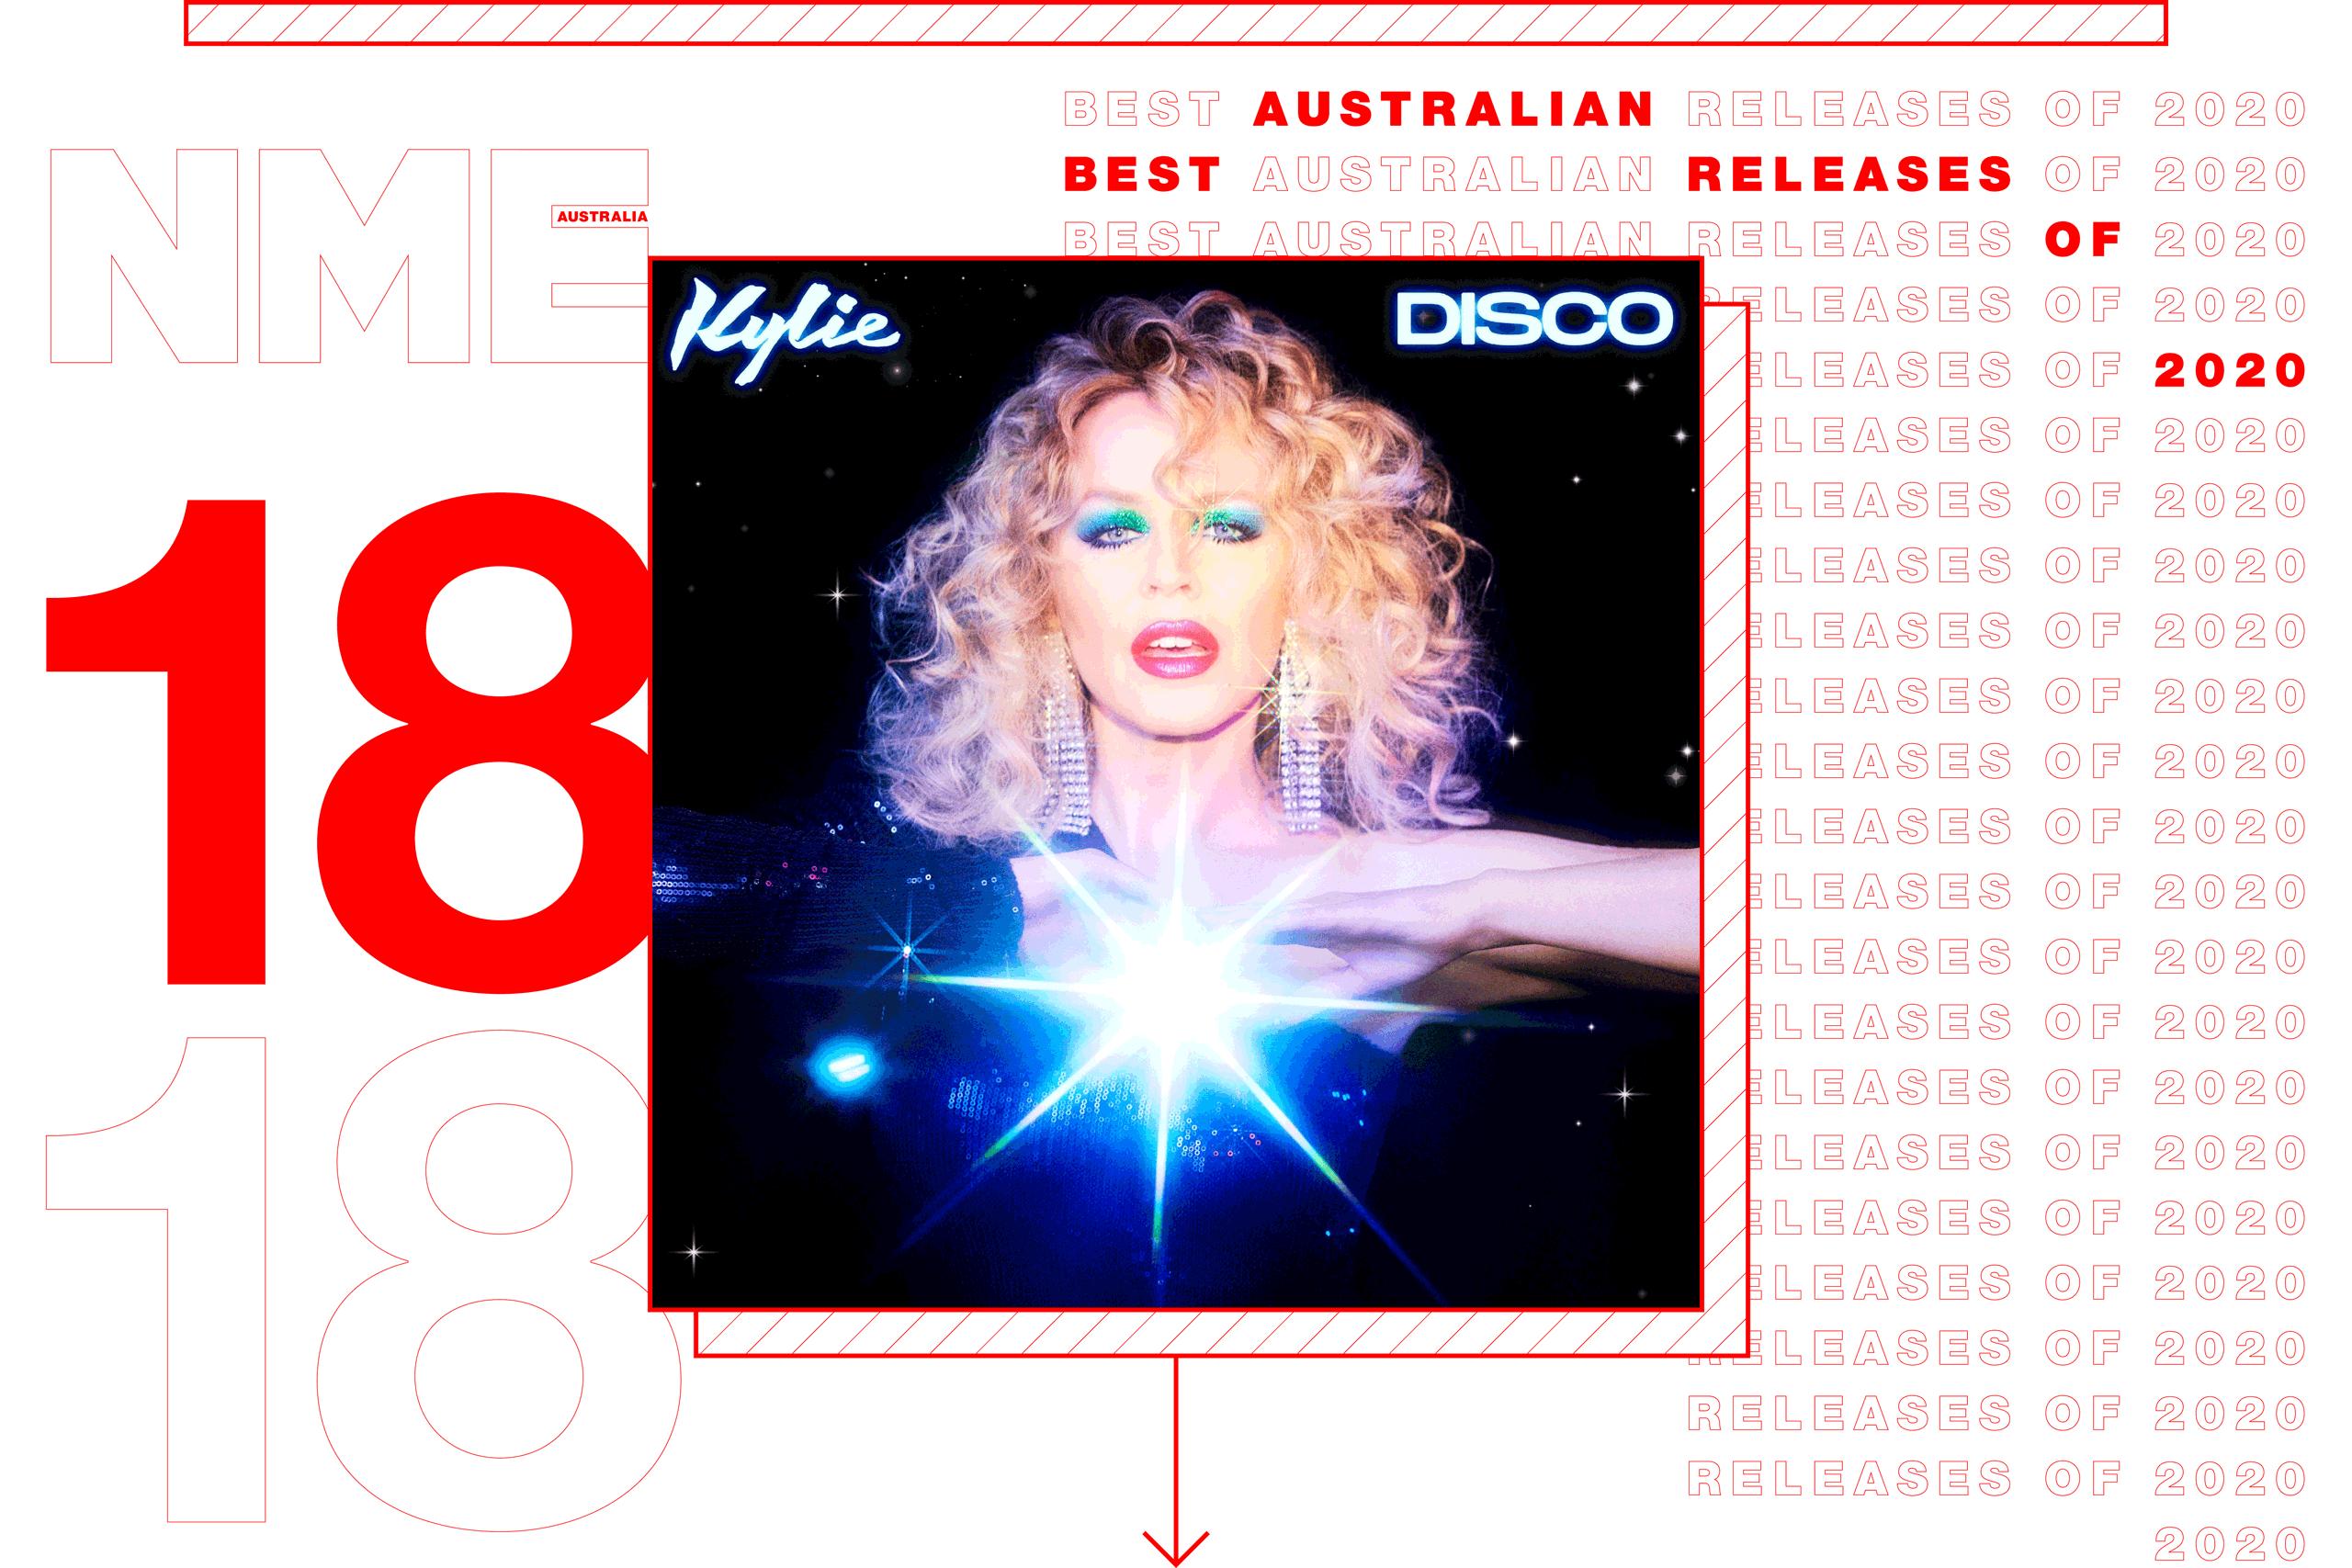 NME Australian Album Release 18